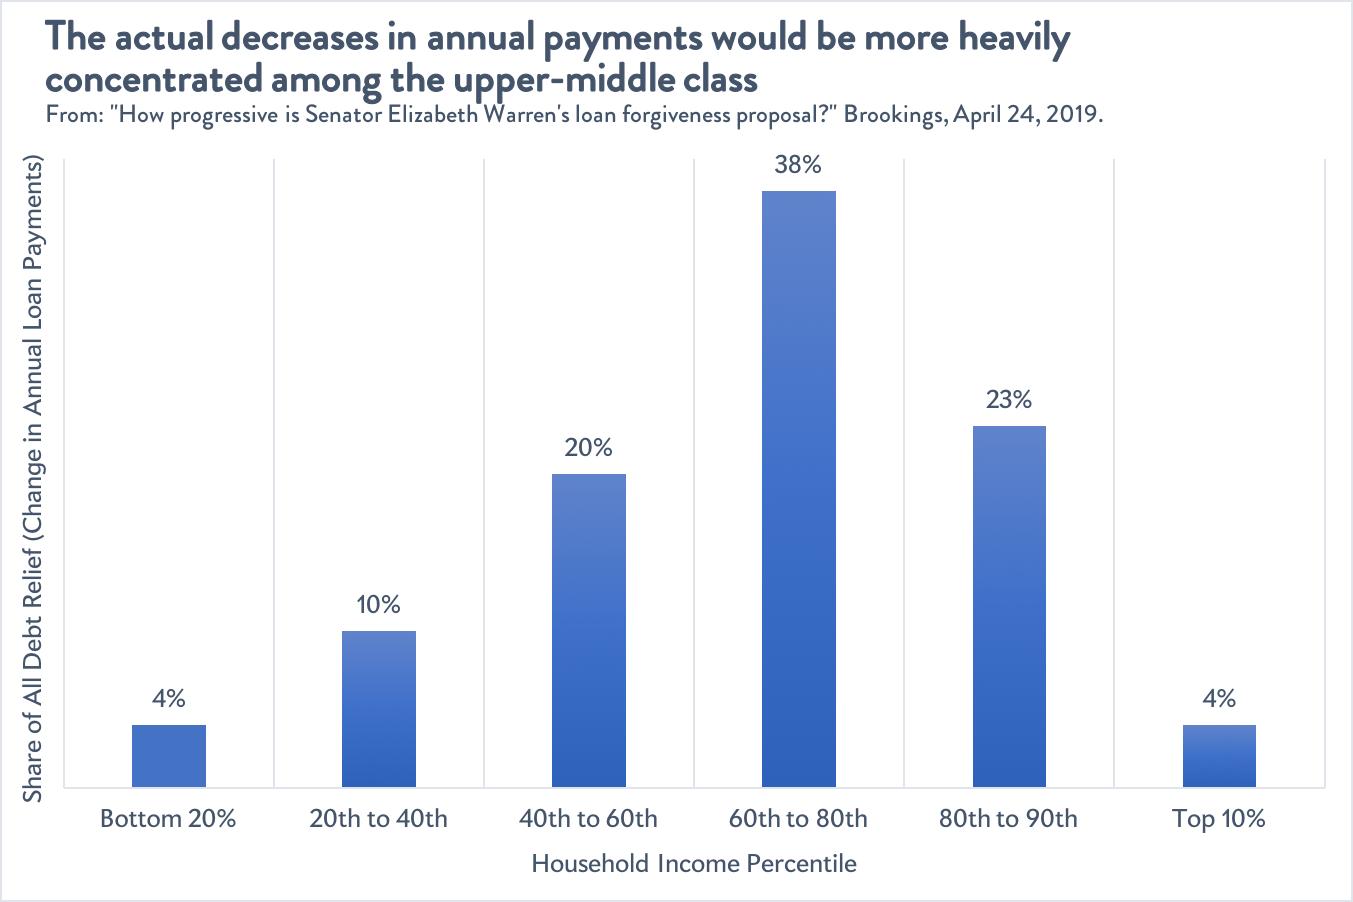 Distribution of student loan relief under Elizabeth Warren's forgiveness plan